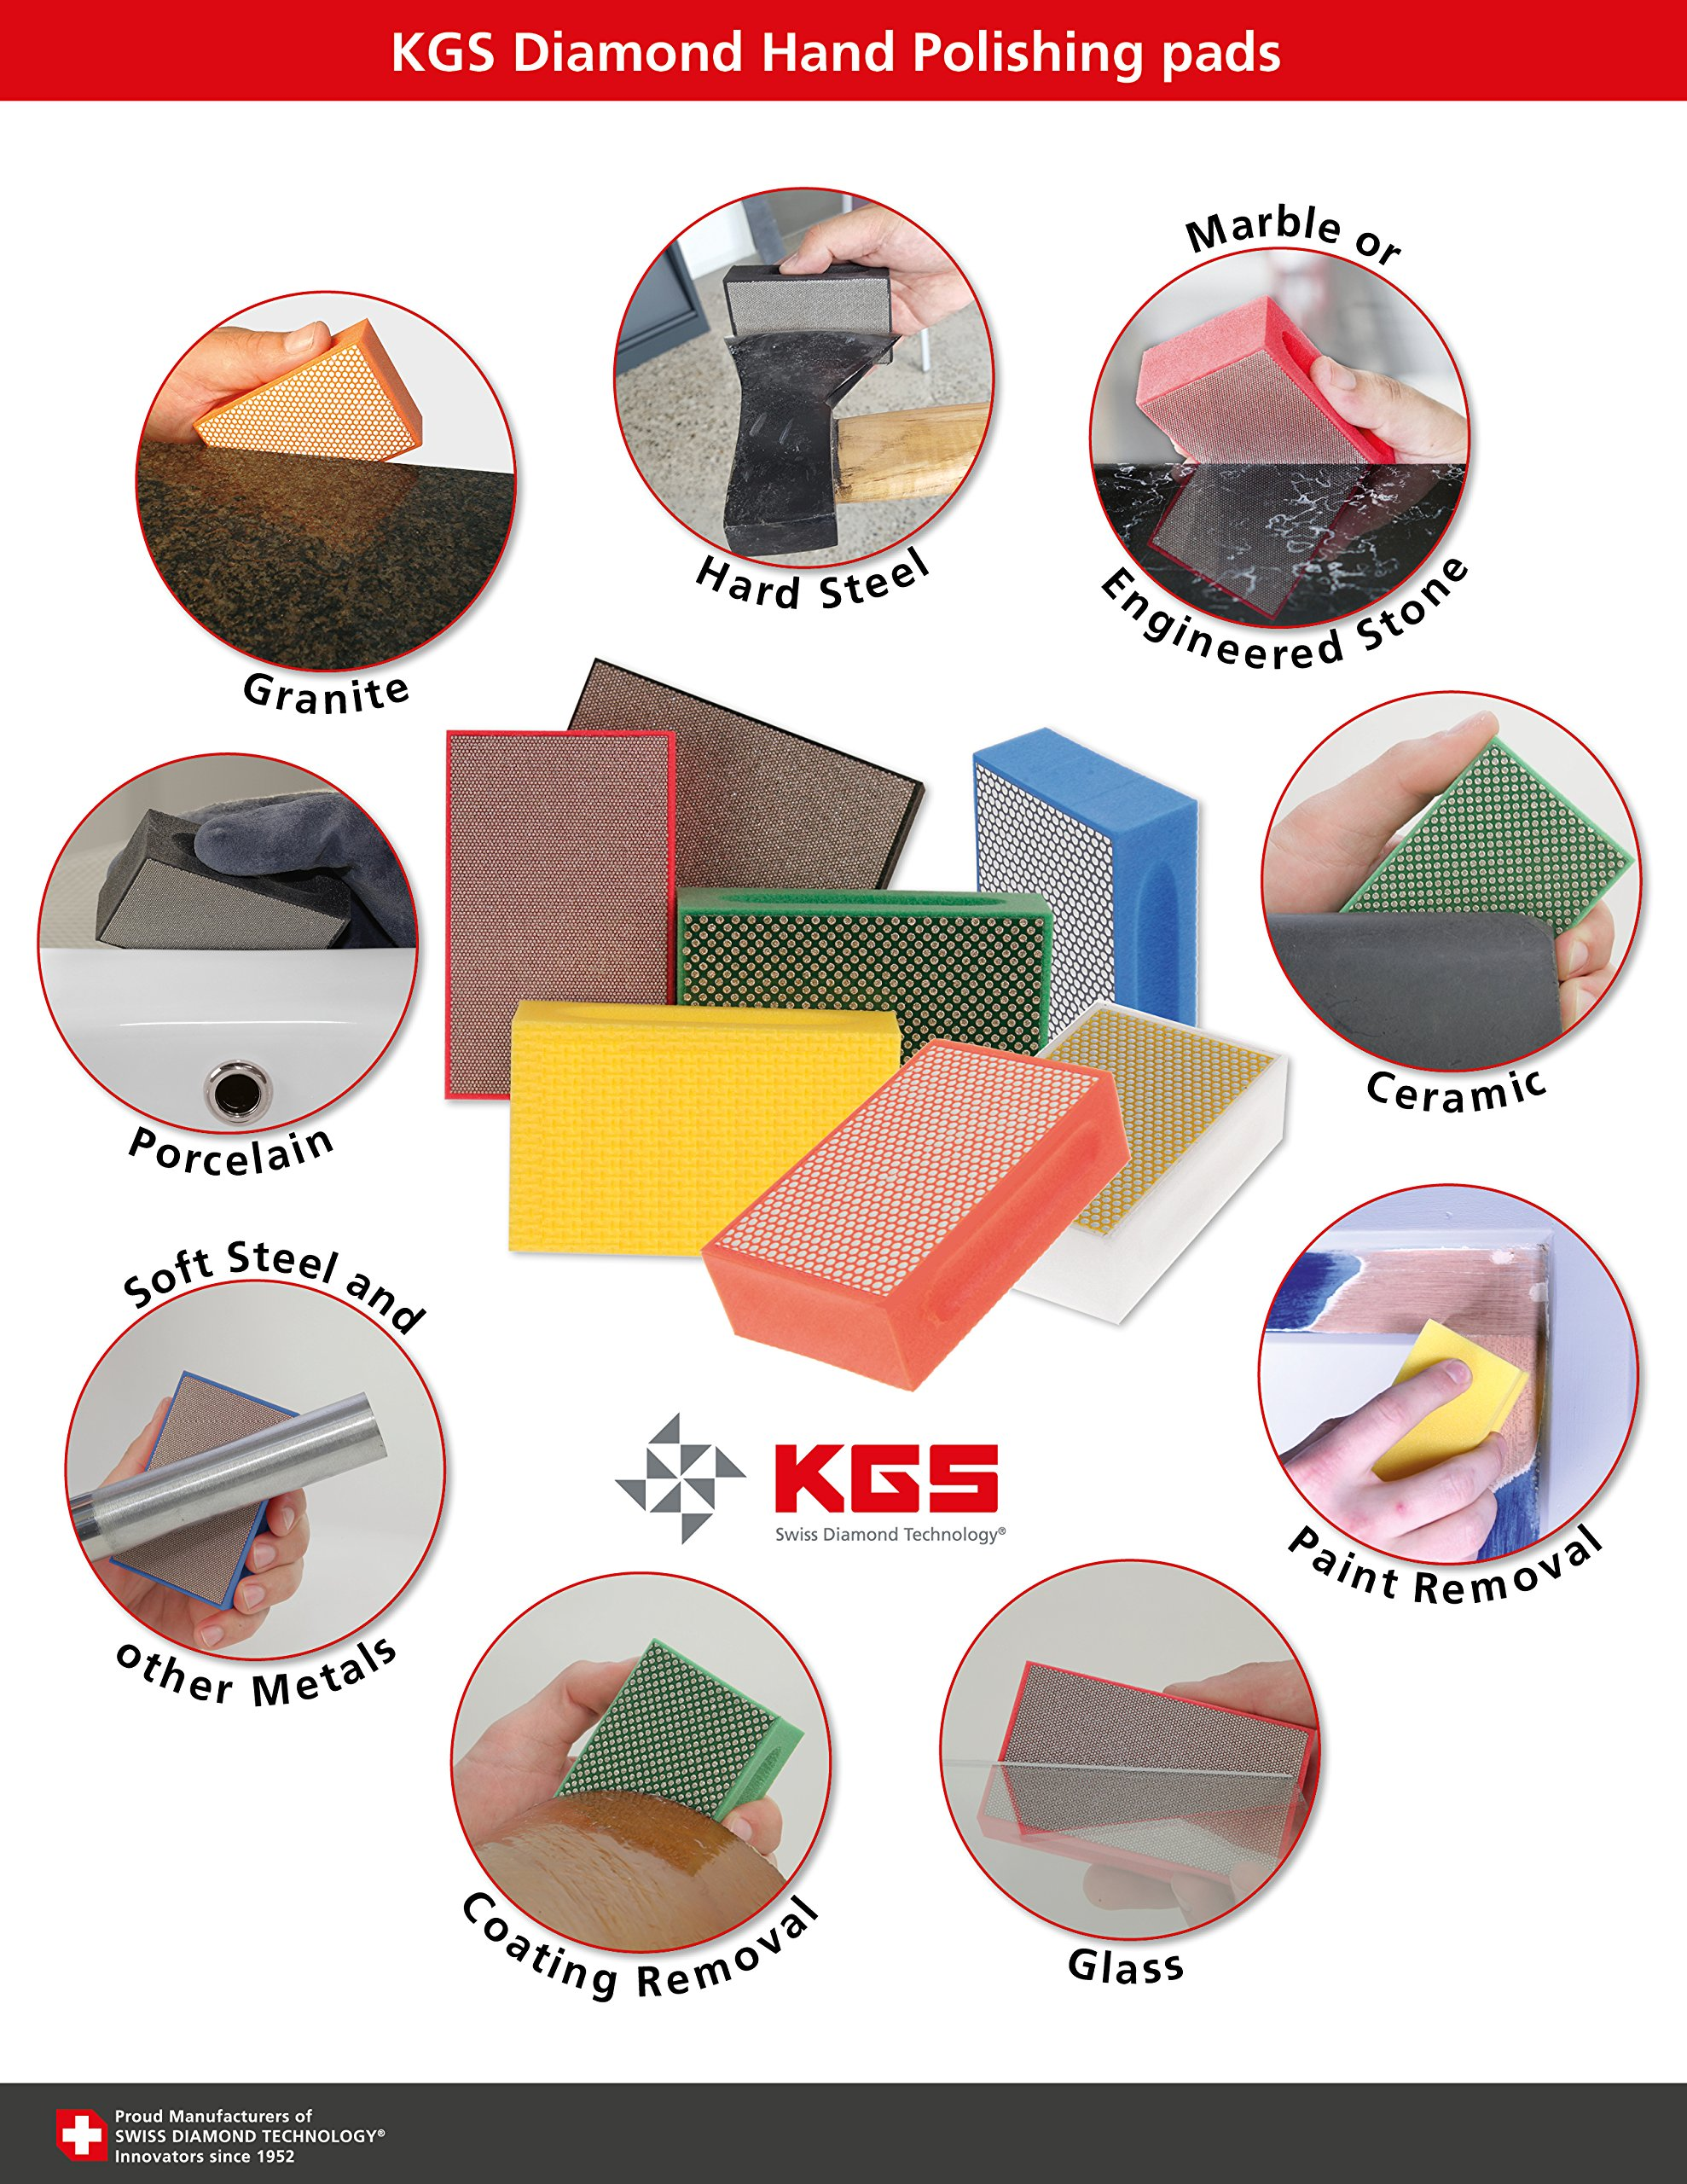 KGS Diamond Hand Polishing pads (3 Pack, Combination set (grit 60, 200, 400)) by KGS (Image #4)